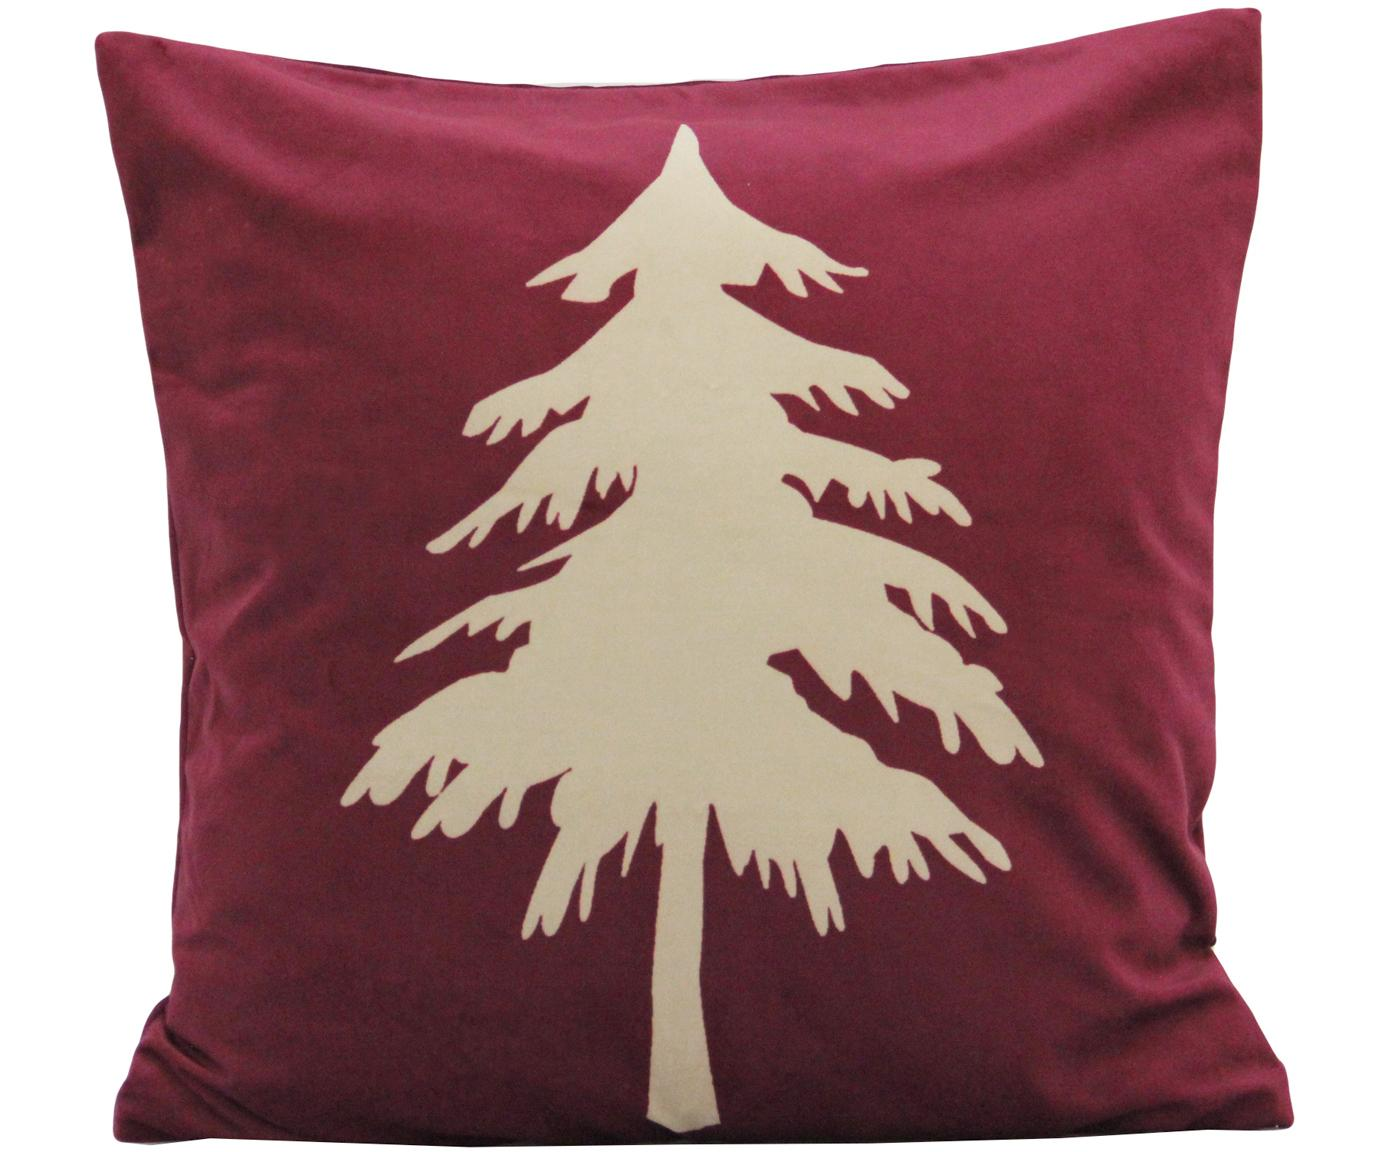 Funda de cojín de terciopelo Christmas Tree, Terciopelo de poliéster, Rojo, beige, An 45 x L 45 cm